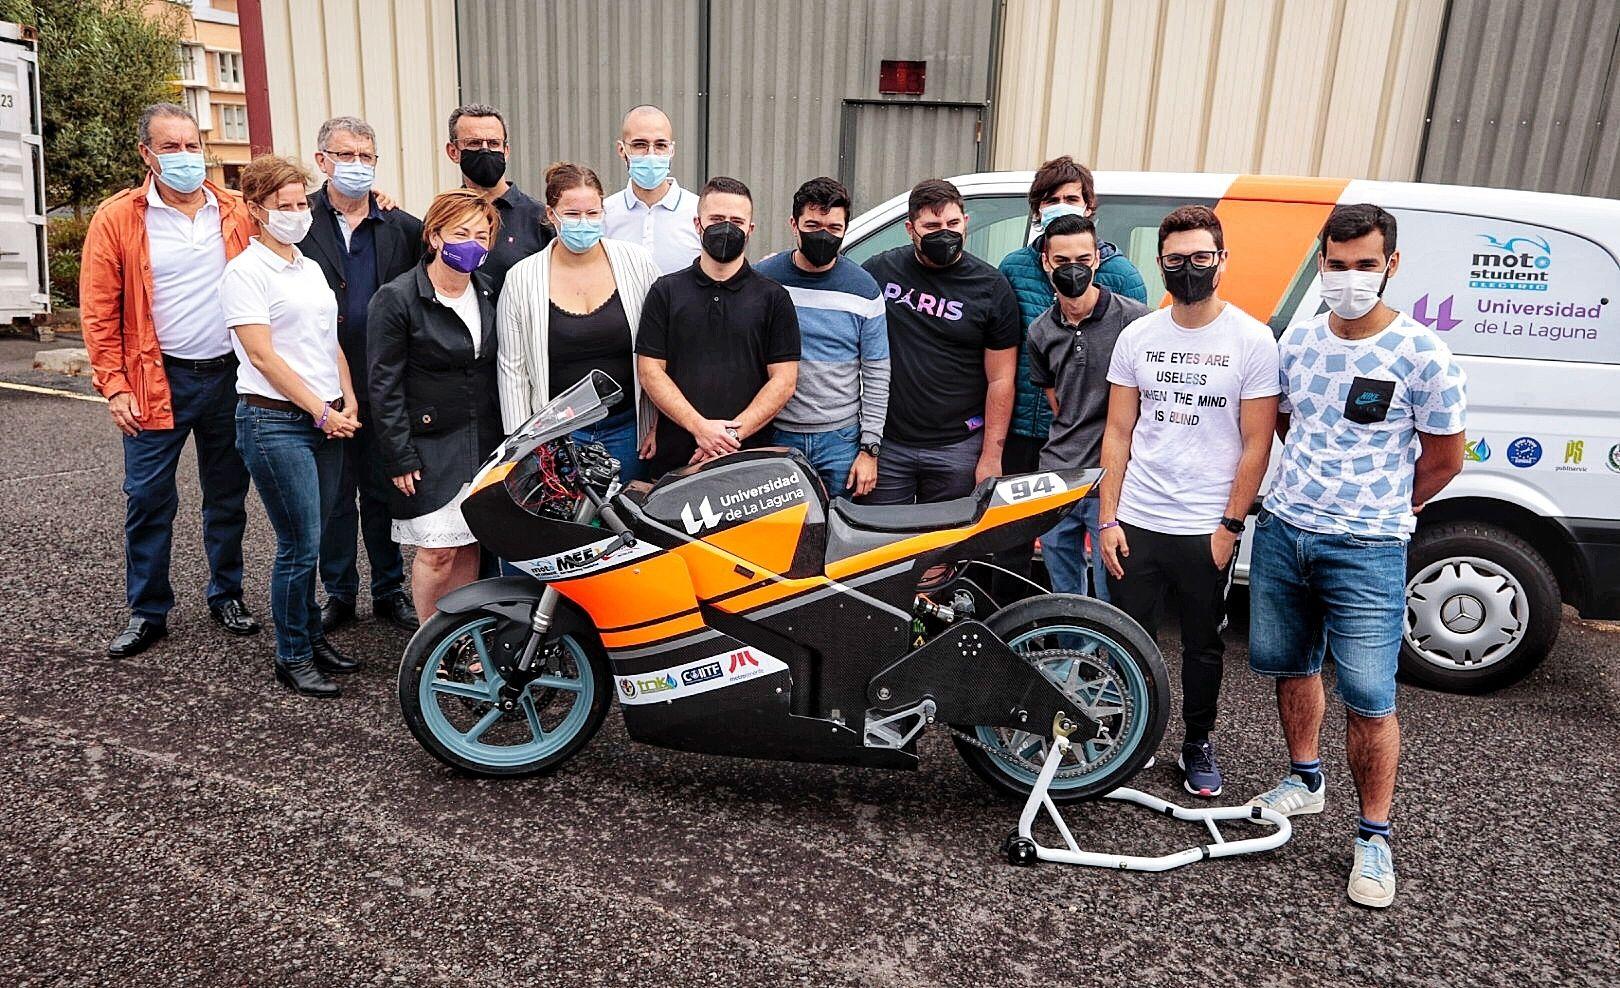 Proyecto MotoStudent de la ULL